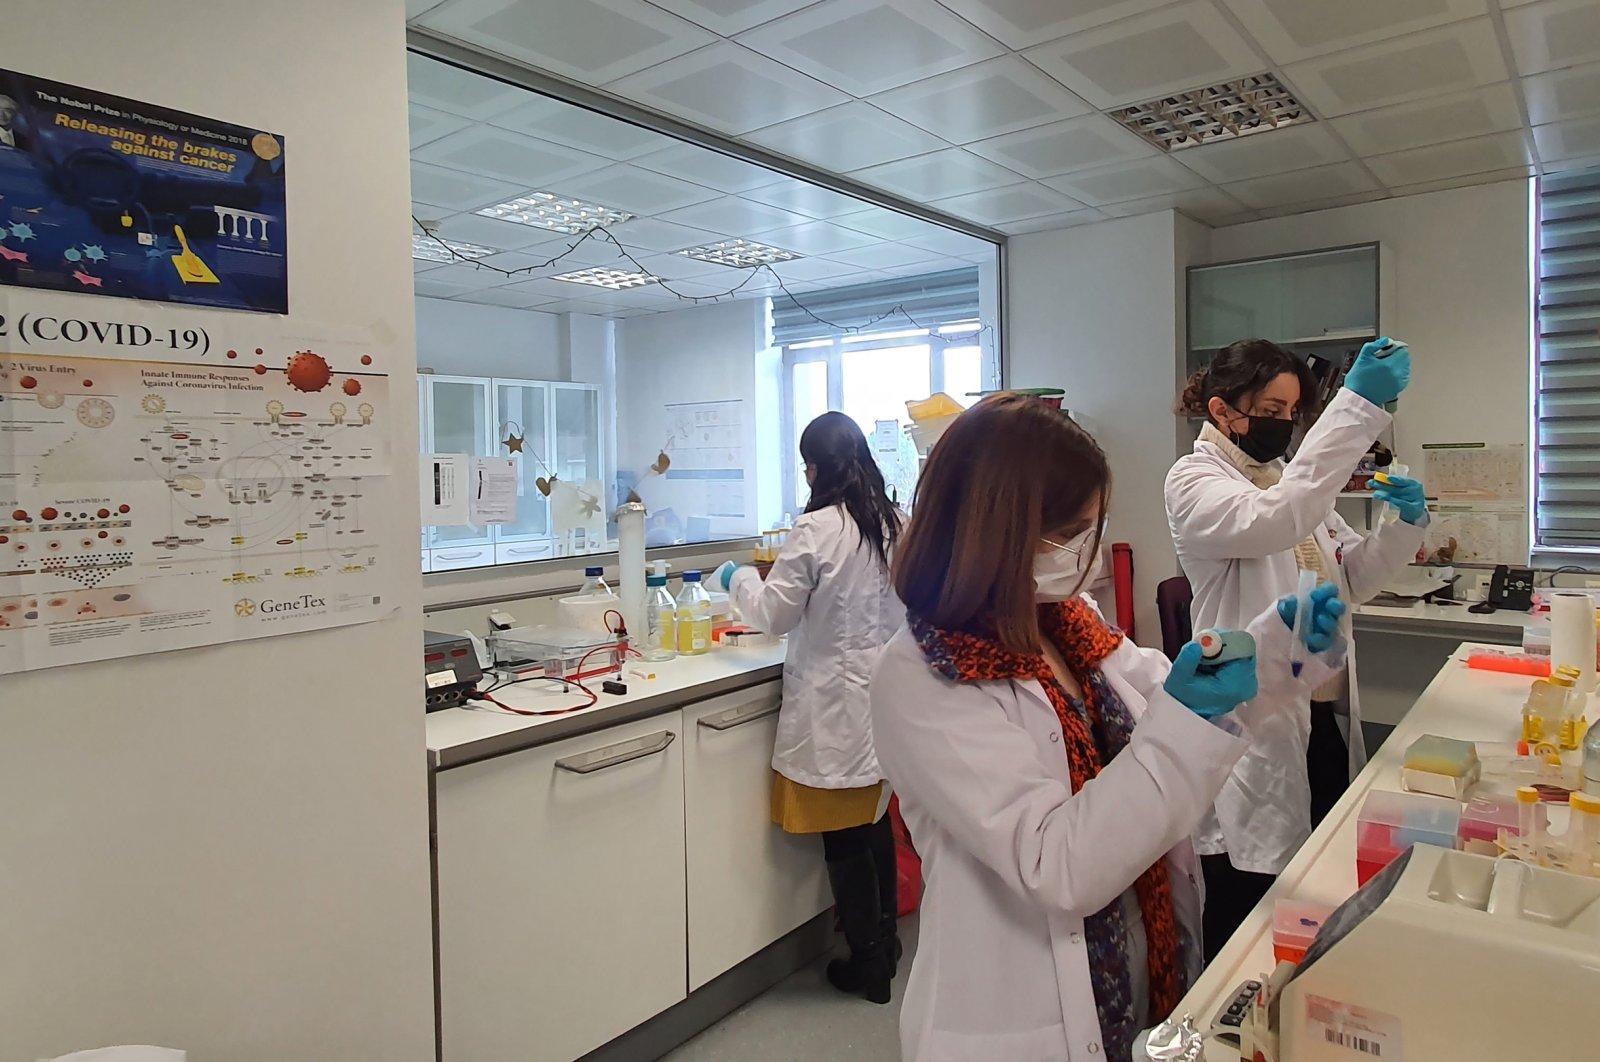 Scientists work at the laboratory at Boğaziçi University, in Istanbul, Turkey, Feb. 25, 2021. (DHA PHOTO)